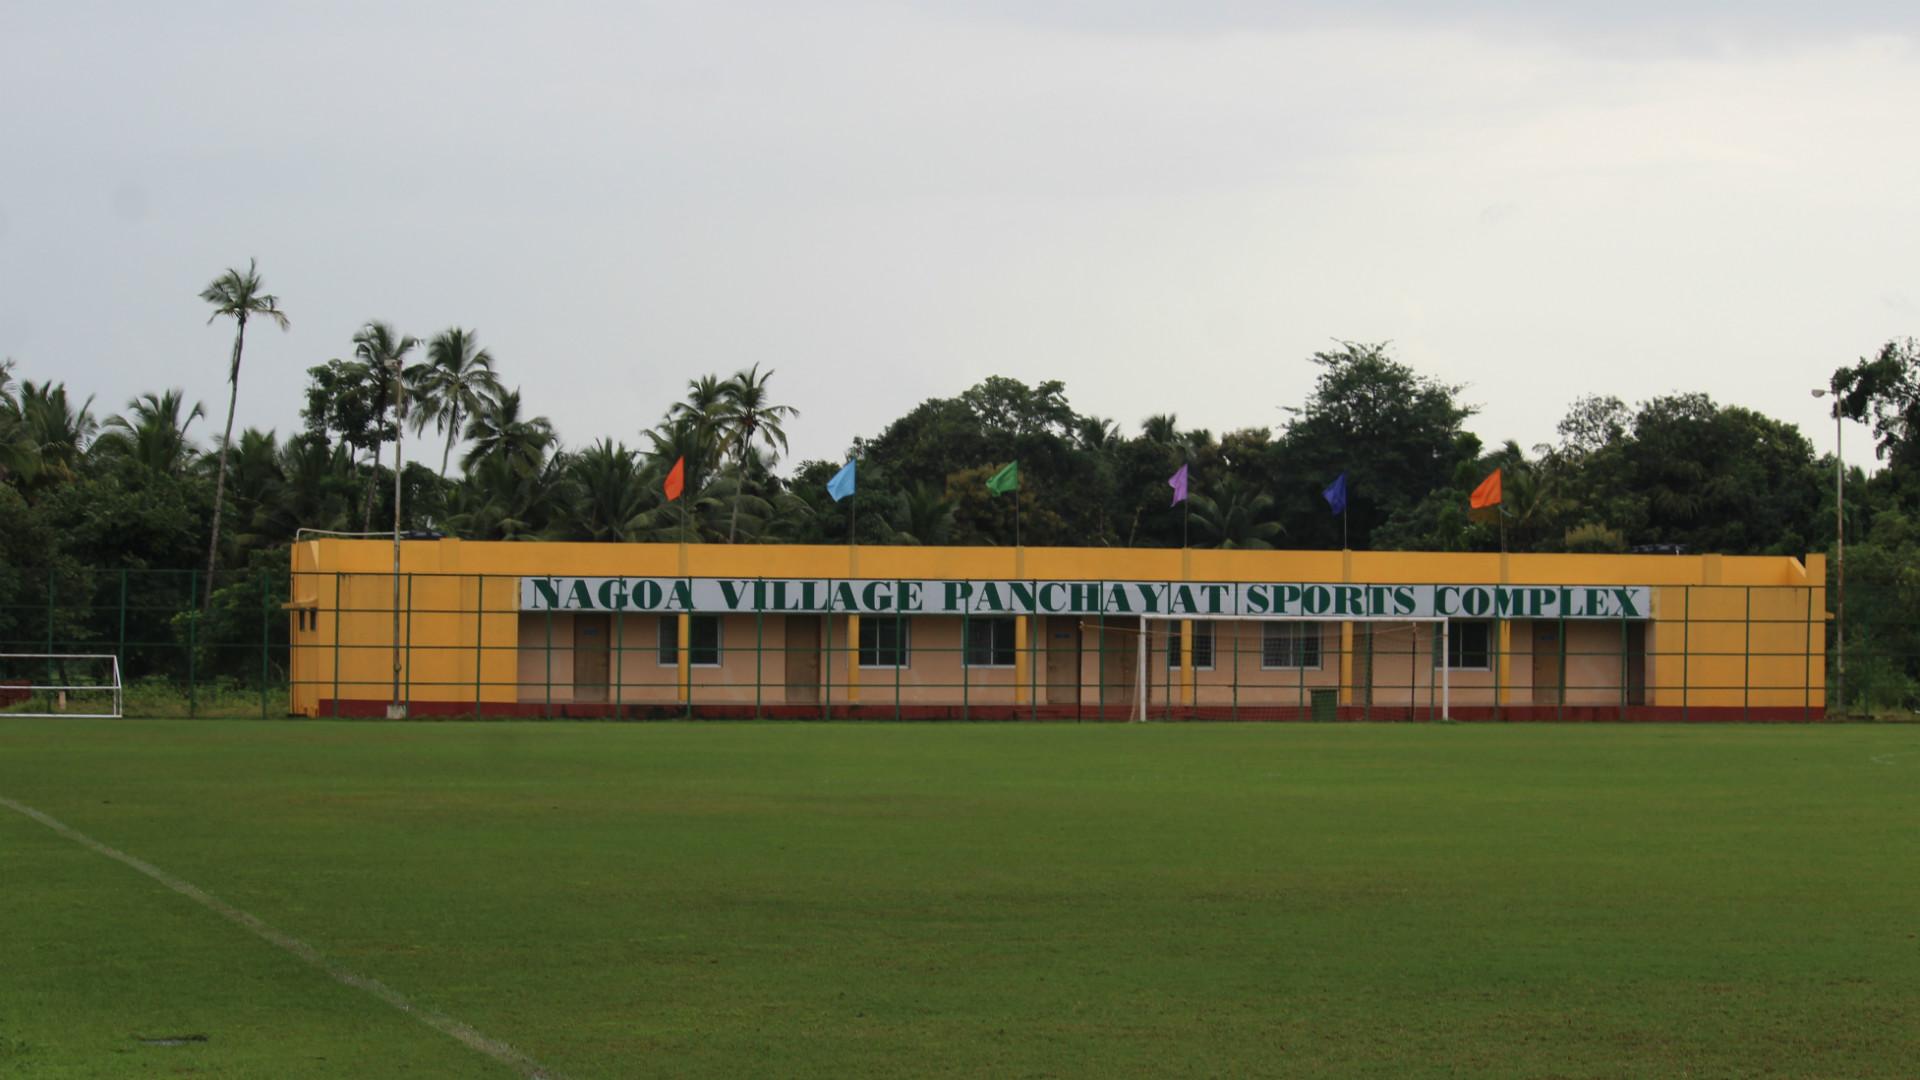 Nagoa Village Panchayat Sports Complex